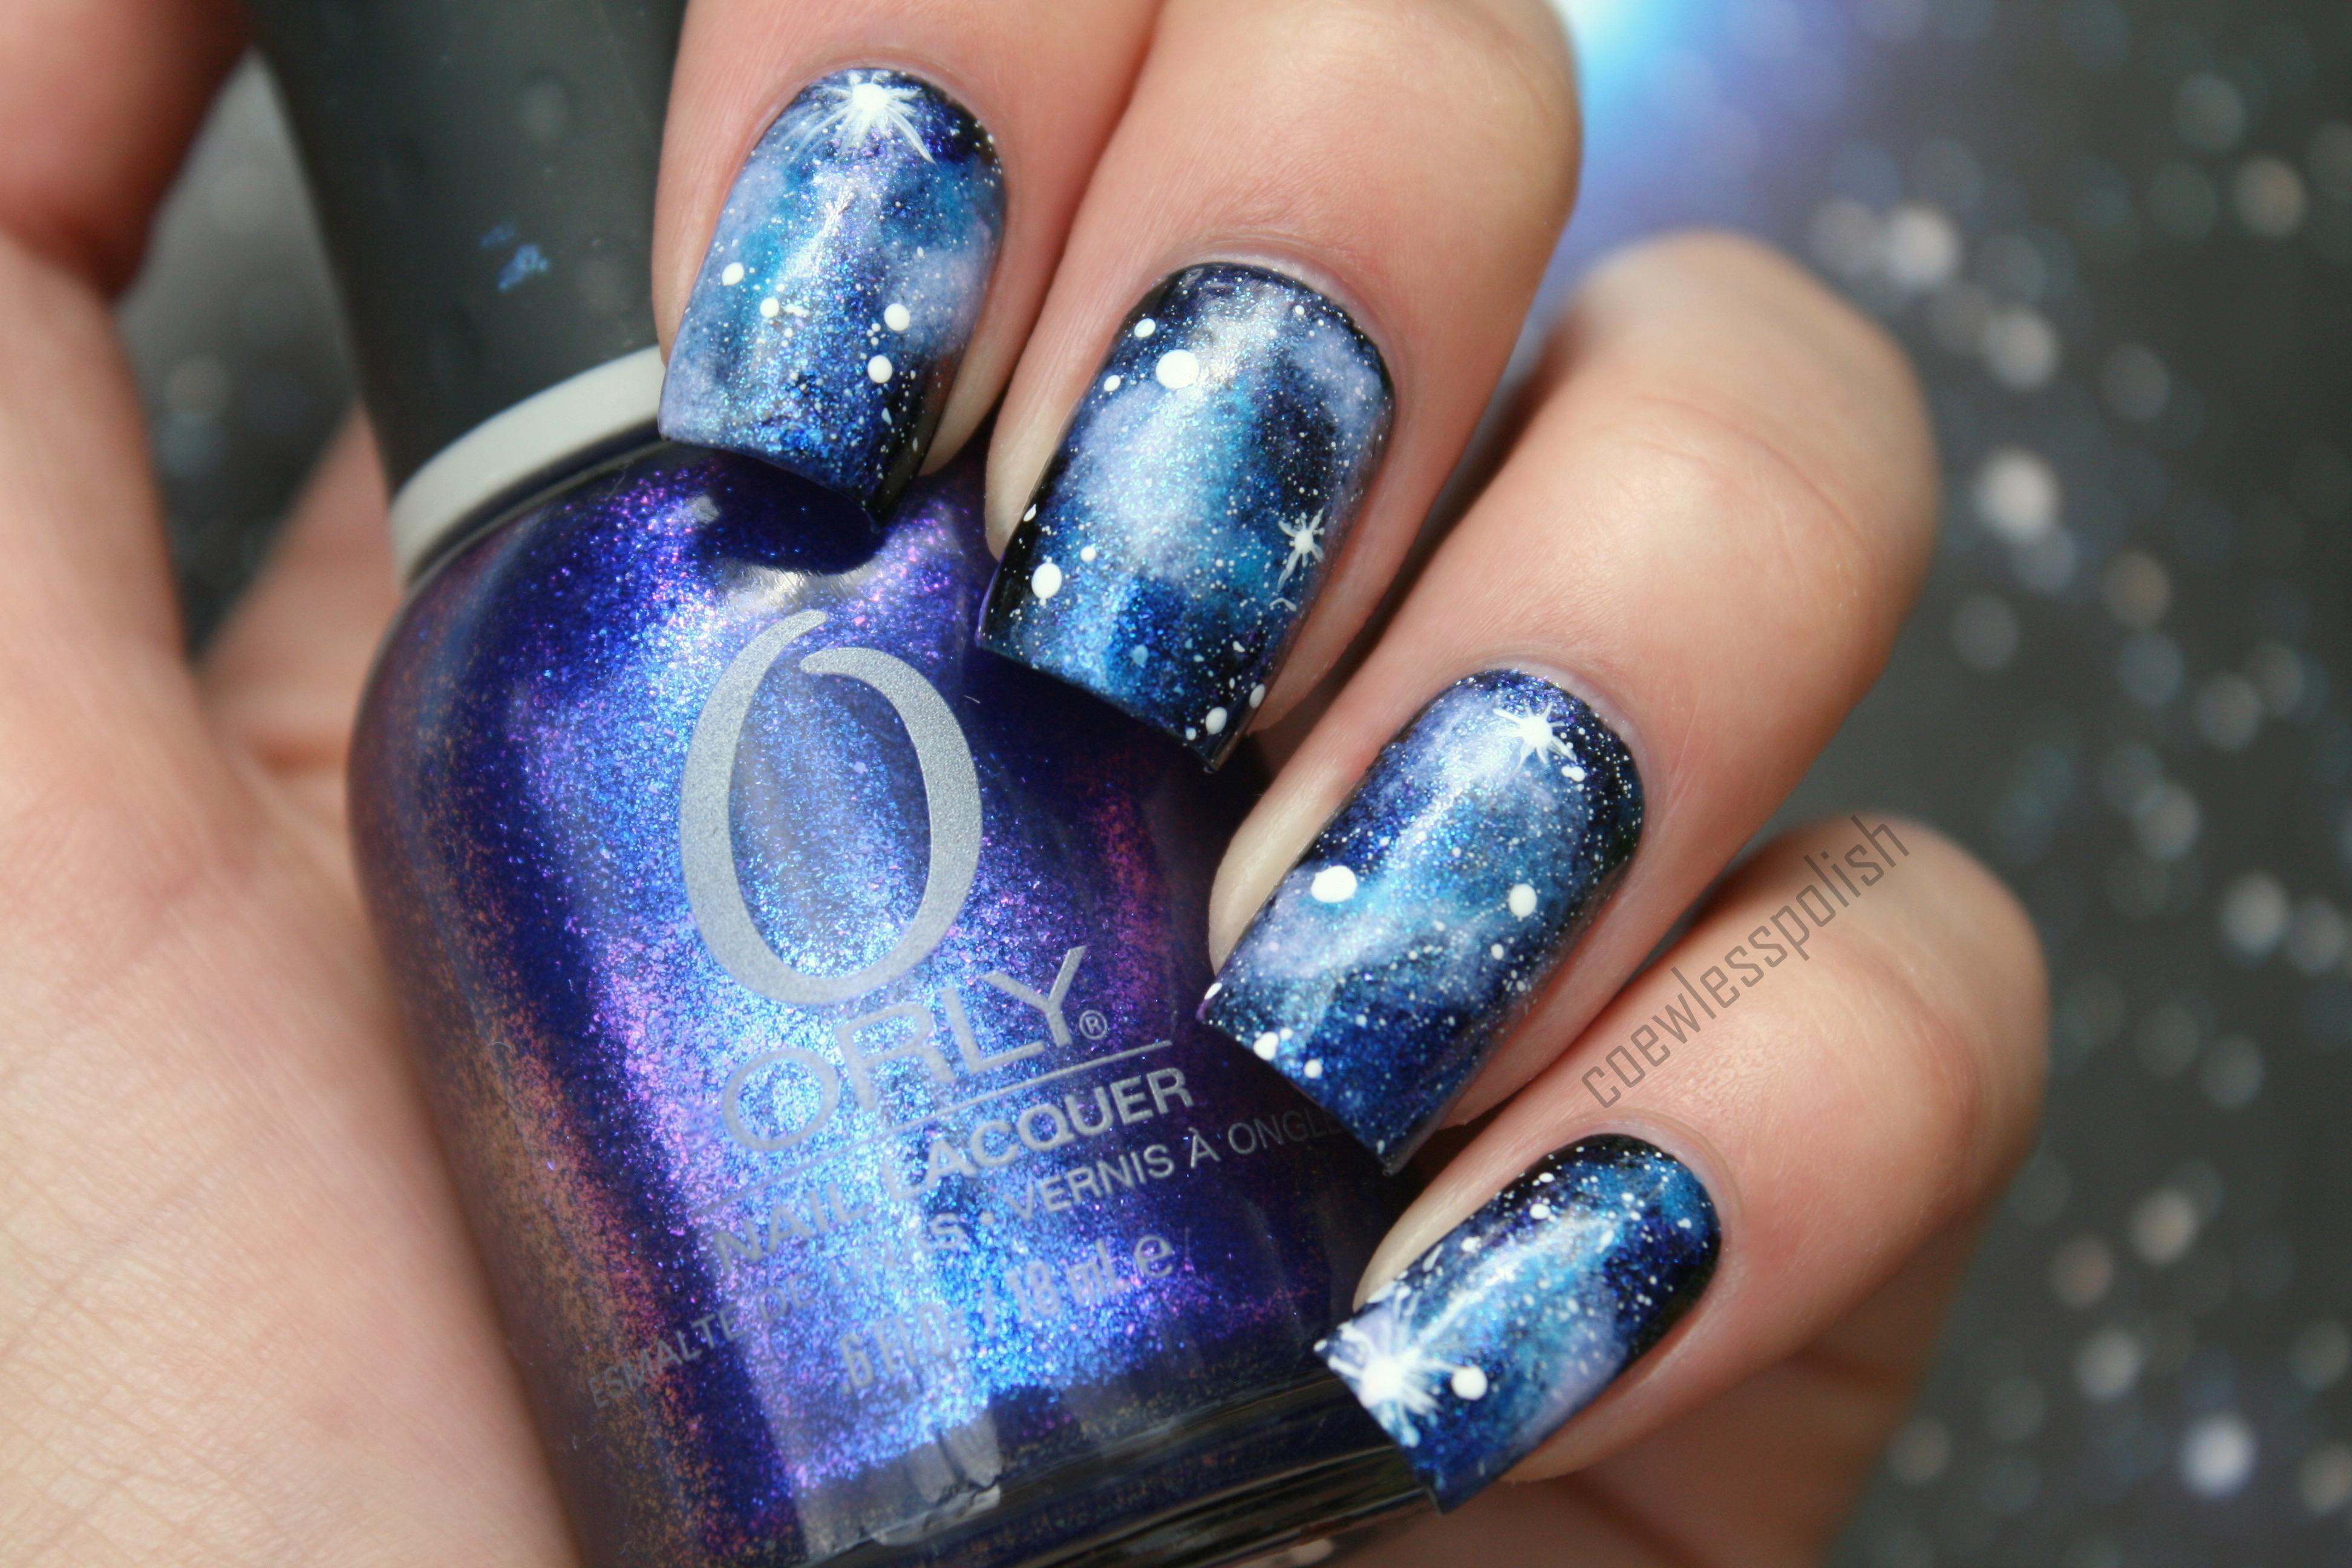 Galaxy Nail Art In Addition Galaxy Nail Art As Well As Galaxy Nail Art